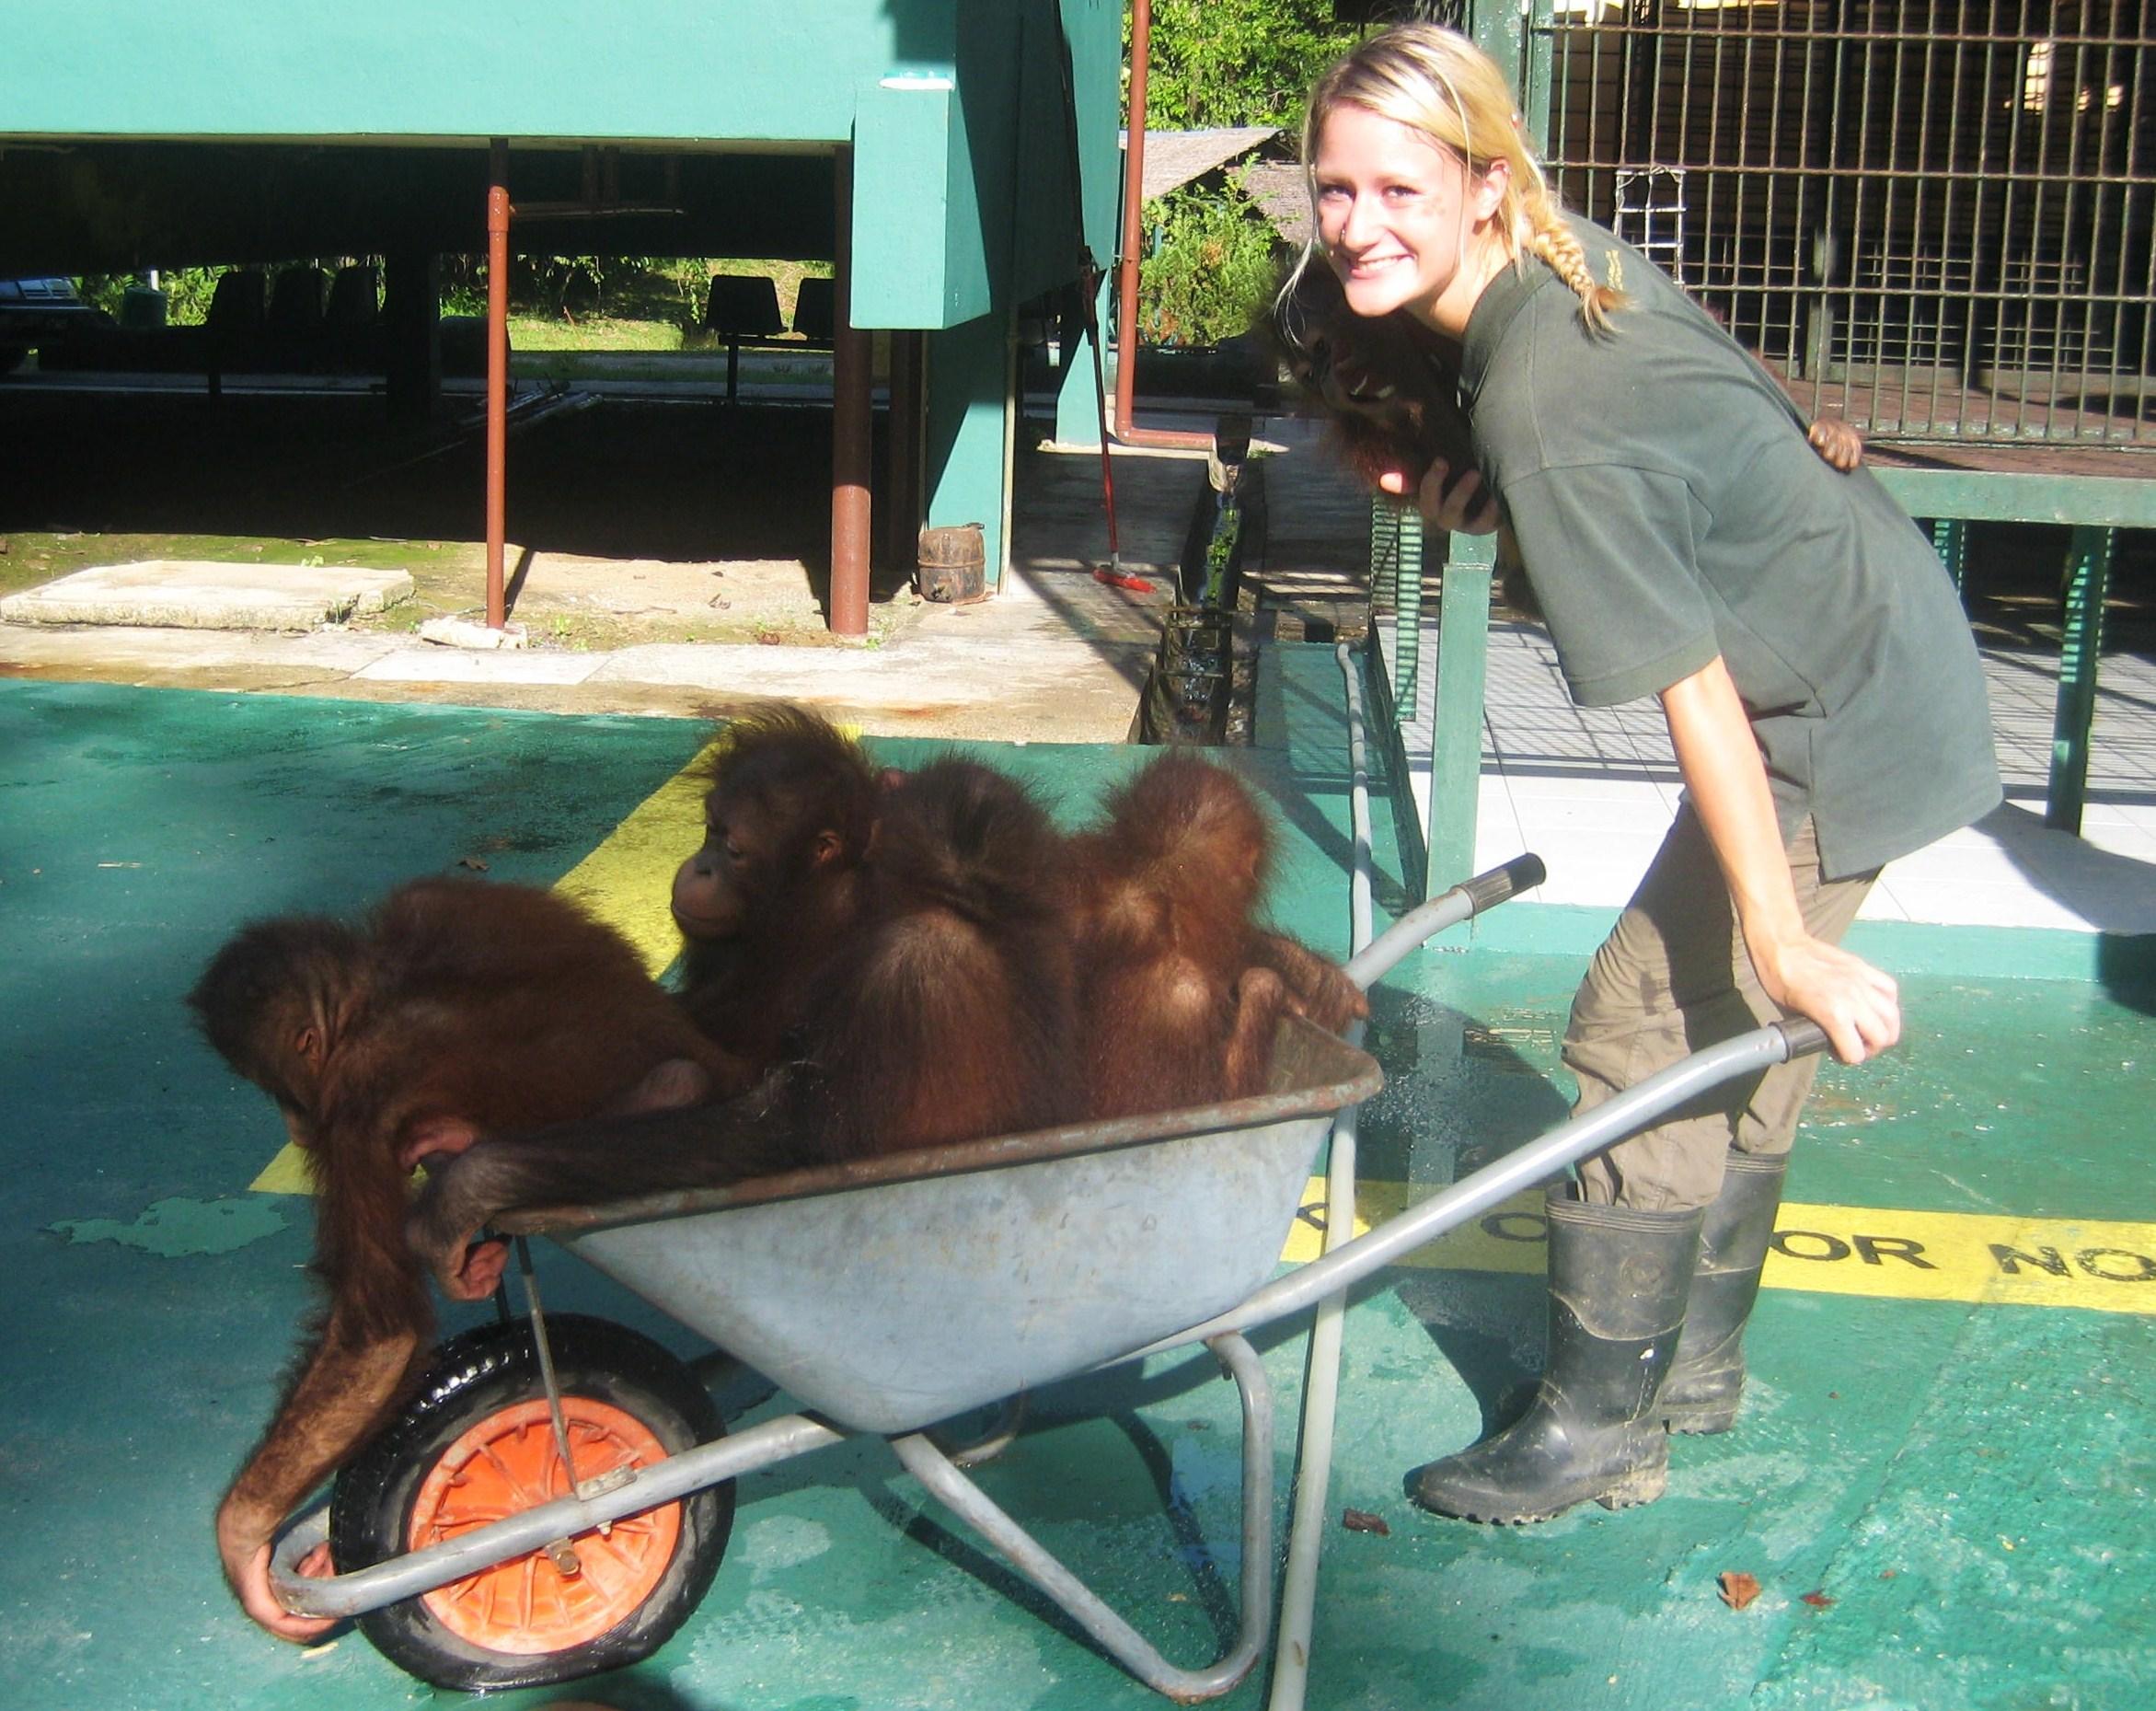 Caring for orphaned Bornean orangutans (Pongo pygmaeus) in Malaysia